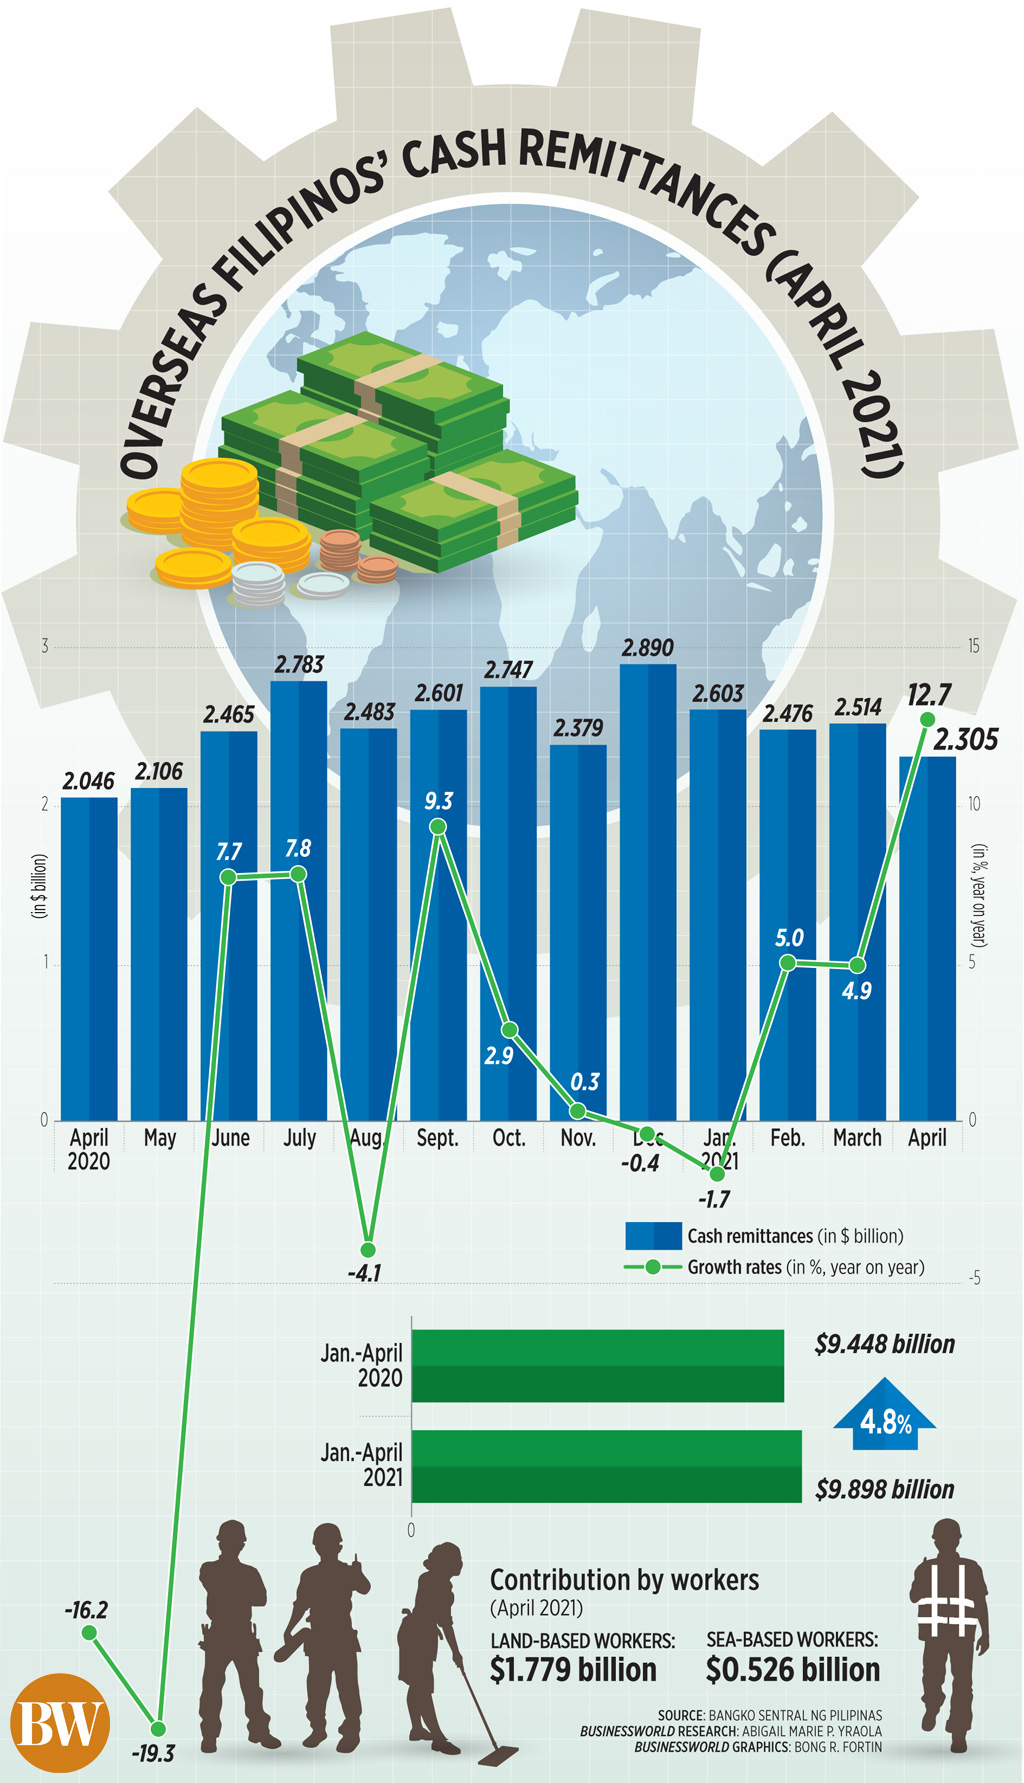 Overseas Filipinos' Cash Remittances (Apr. 2021)